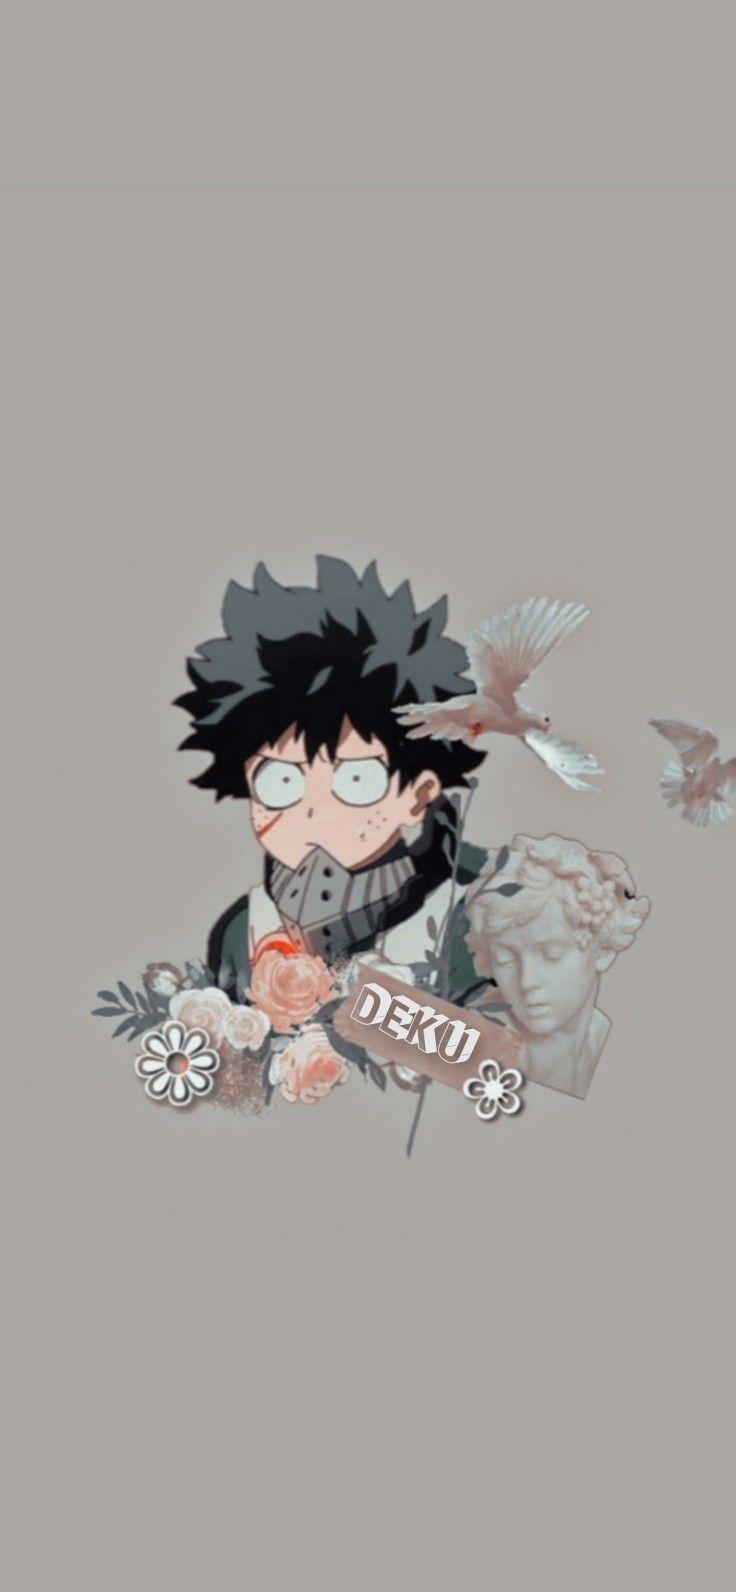 Anime Wallpaper Anime Wallpaper Cute Anime Wallpaper Cool Anime Wallpapers